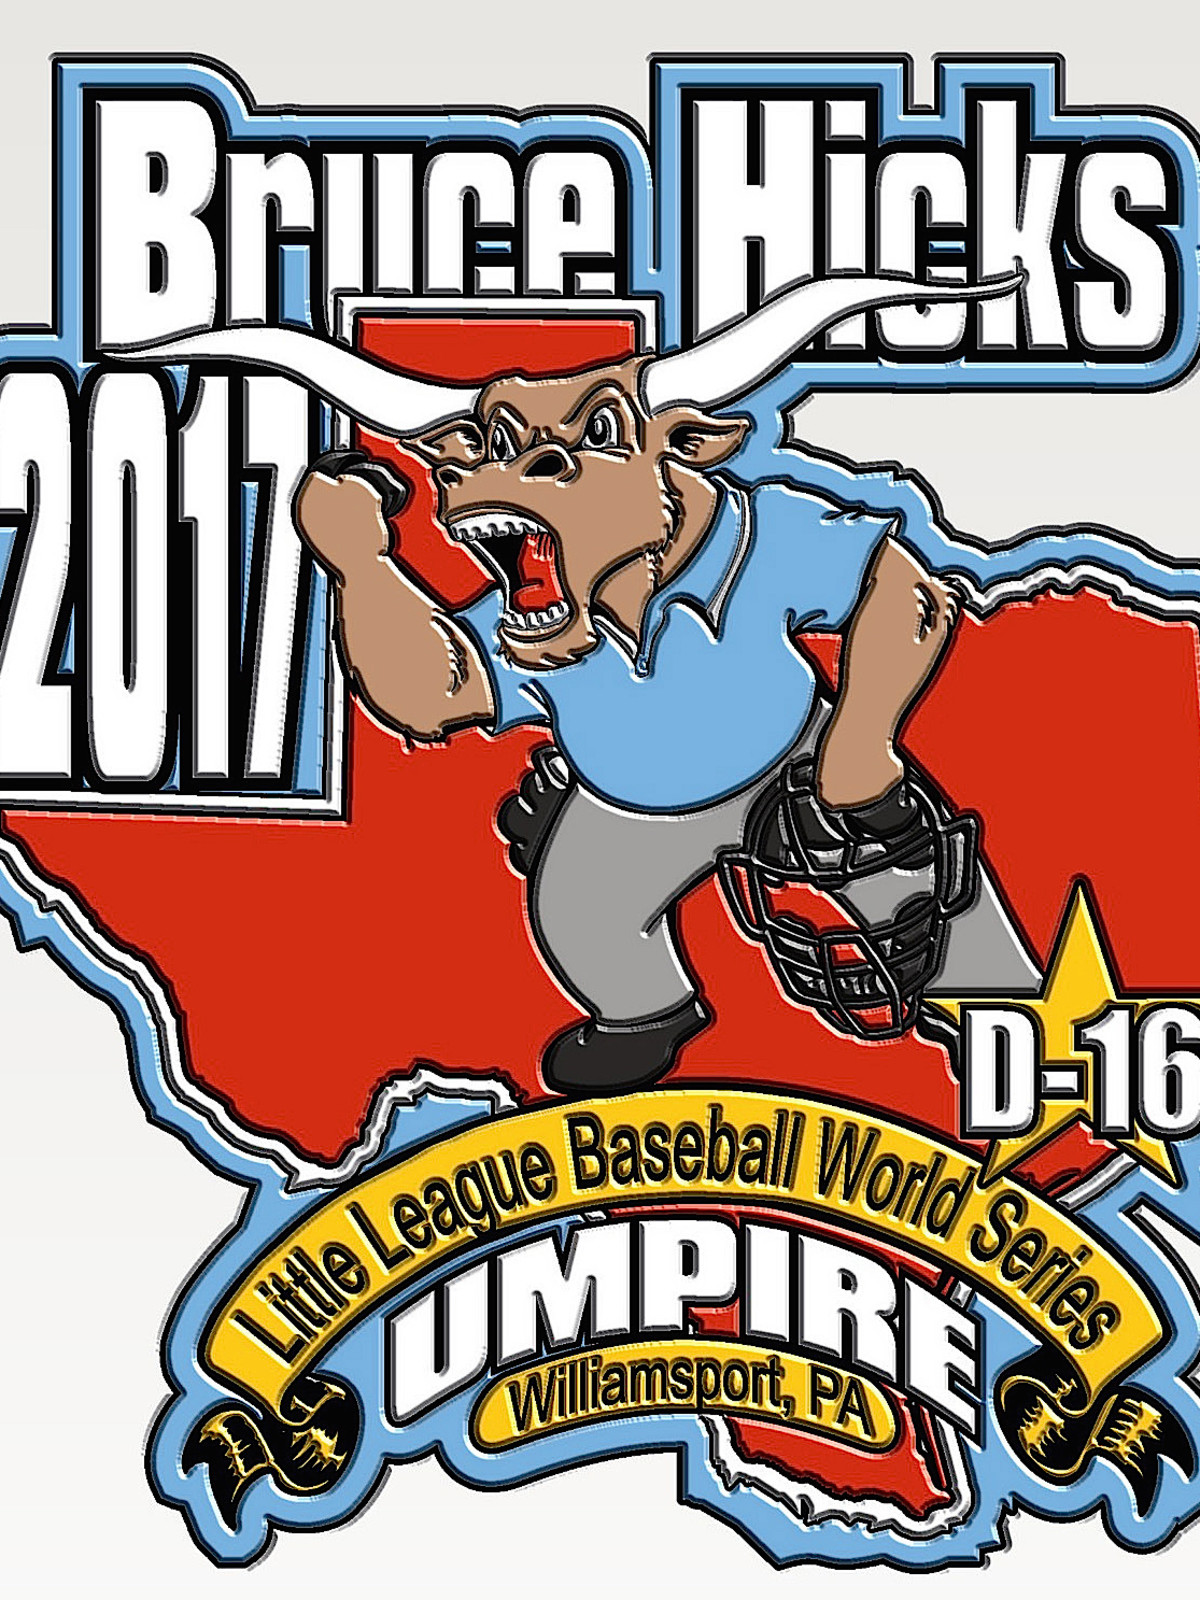 Houston, Bruce Hicks Little League umpire, August 2017, Little League pin